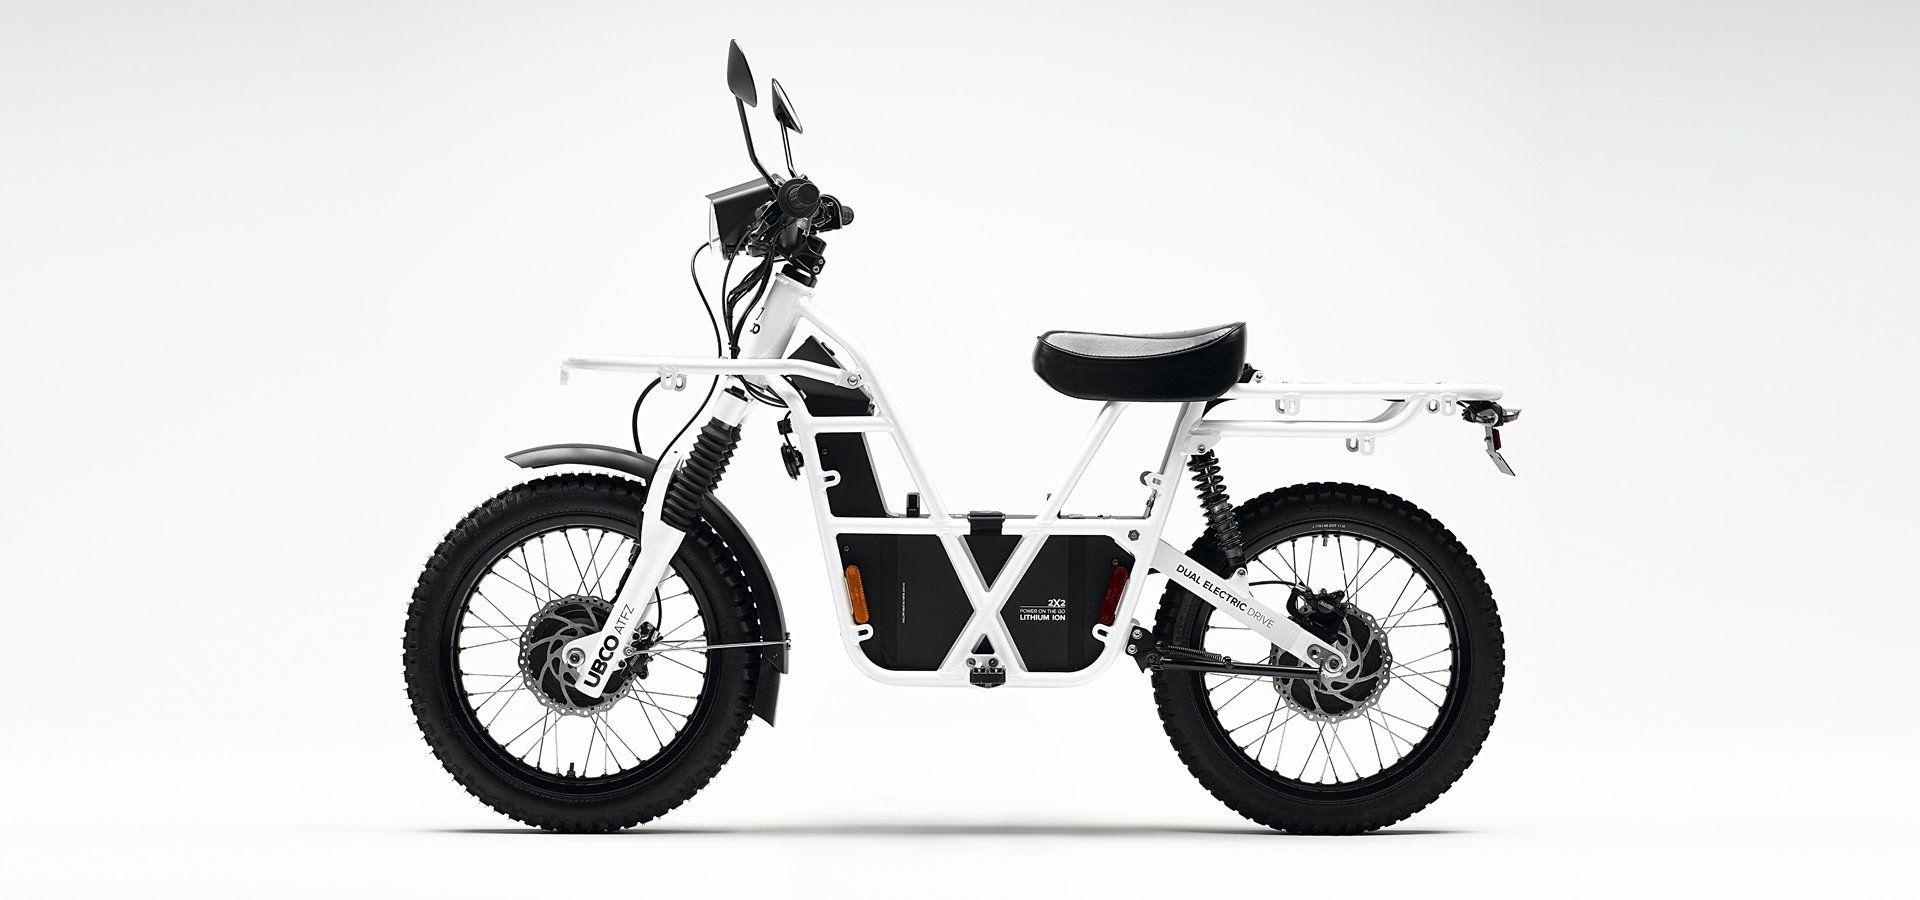 UBCO 2x2 Electric Motorcycle Side 2